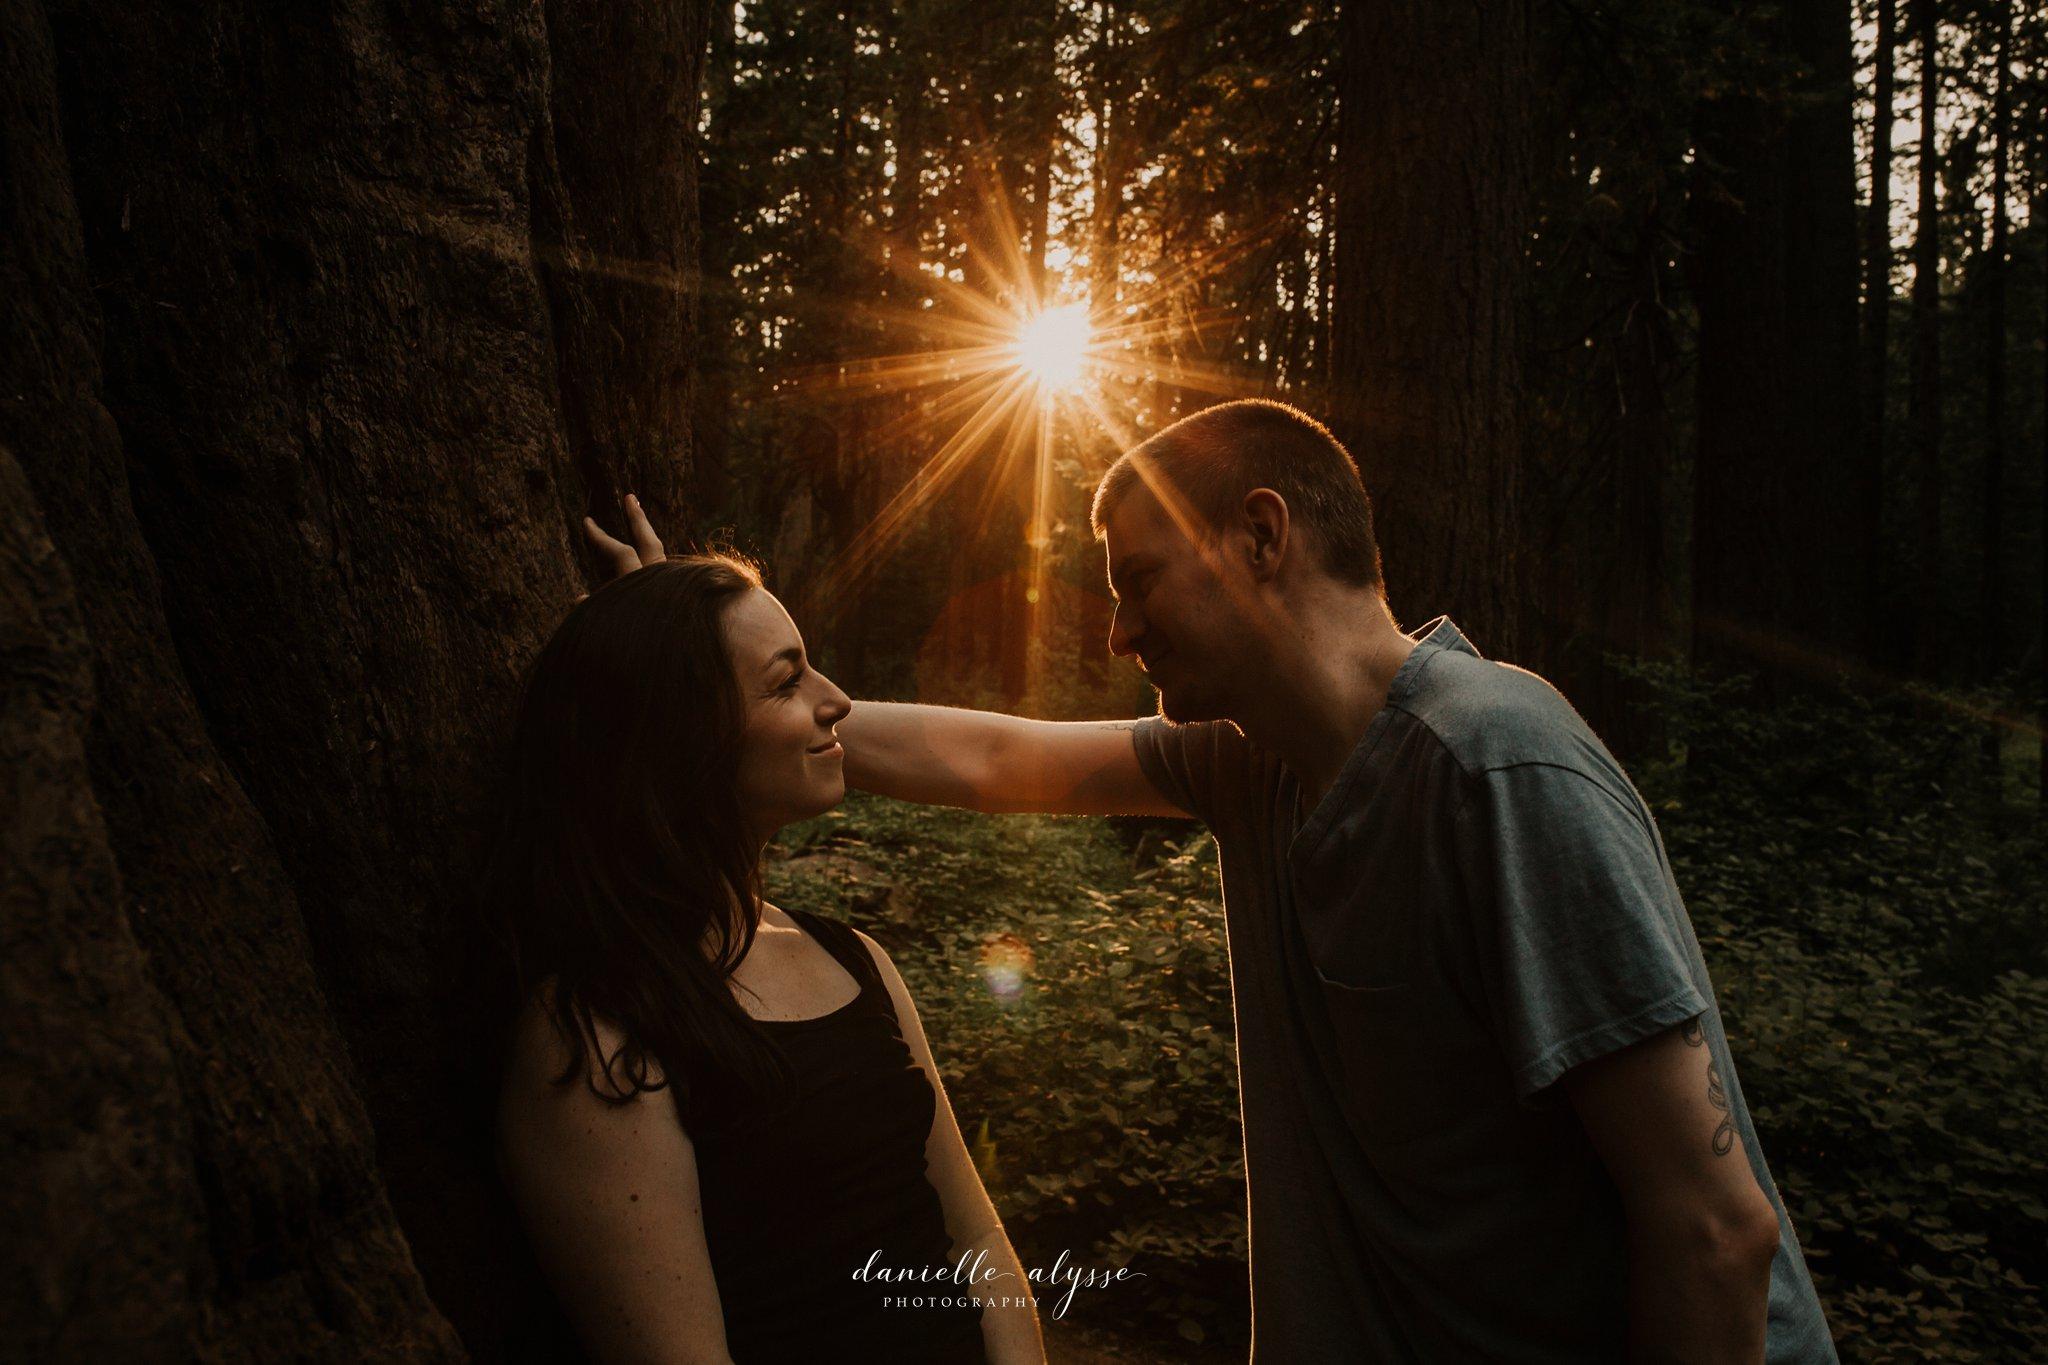 180811_engagement_kathryn_calvaras_big_trees_park_arnold_danielle_alysse_photography_blog_67_WEB.jpg